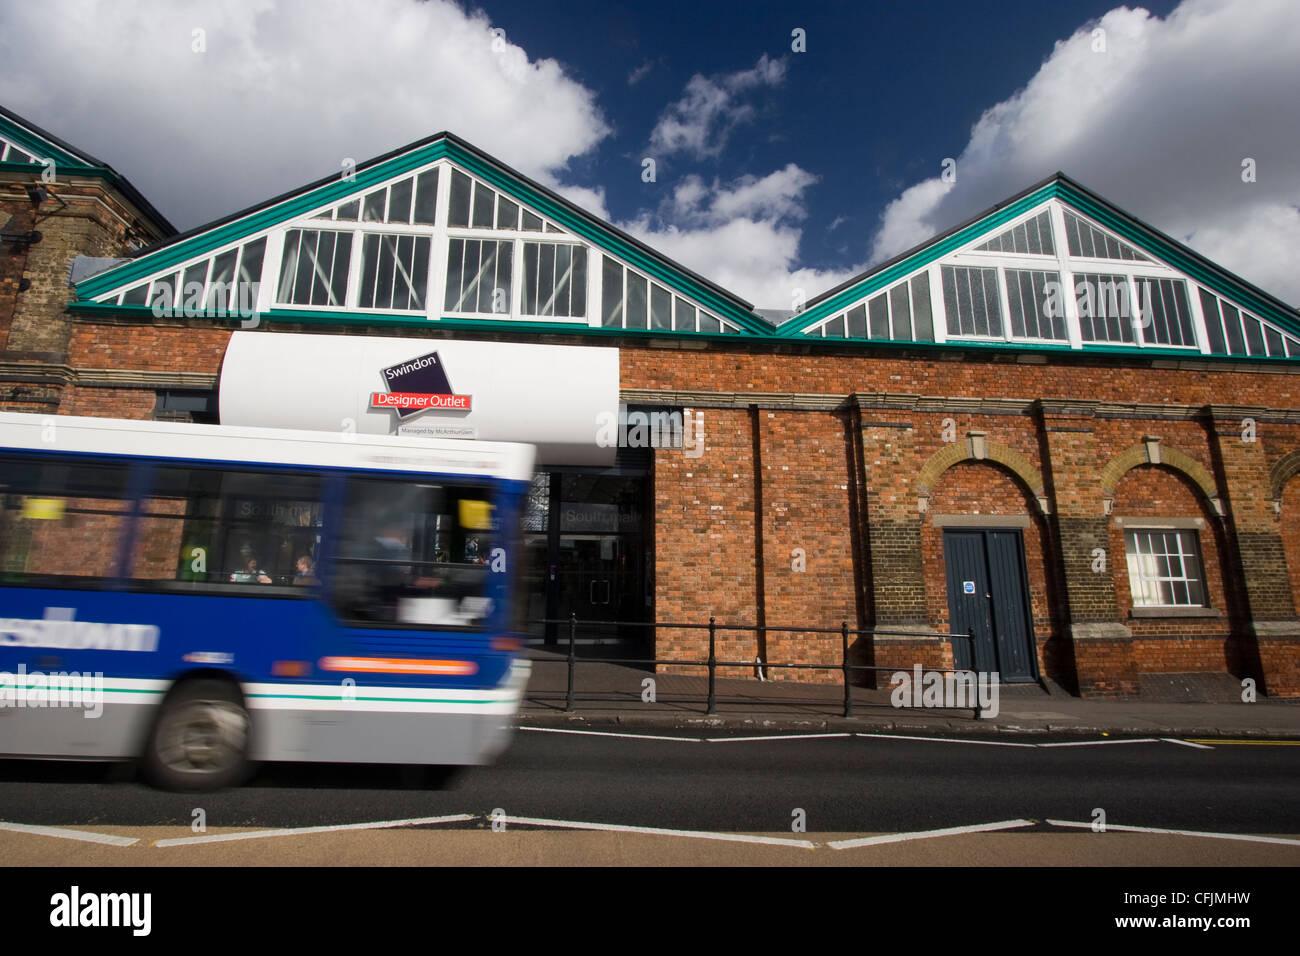 5c2b2121e8 The McArthurGlen Designer Outlet Village shopping centre in the old Swindon  GWR railworks - Stock Image